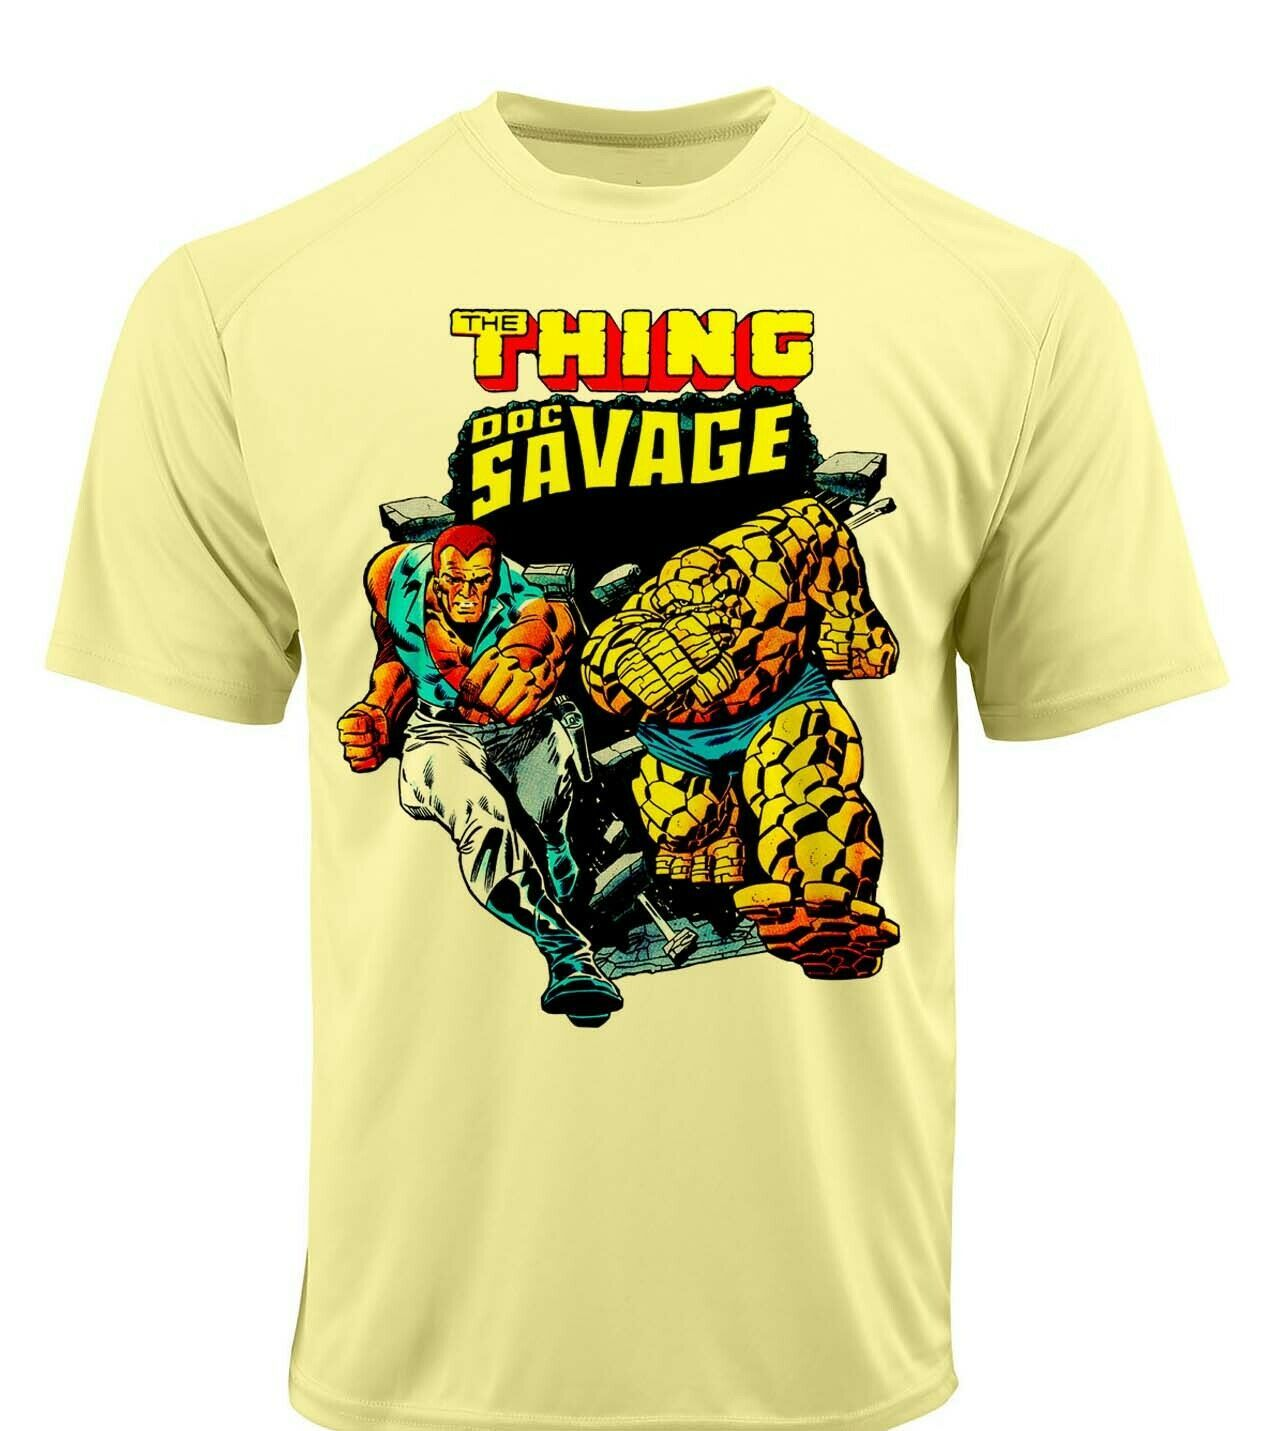 Thing doc savage dri fit graphic tshirt moisture wicking superhero comic spf tee 2